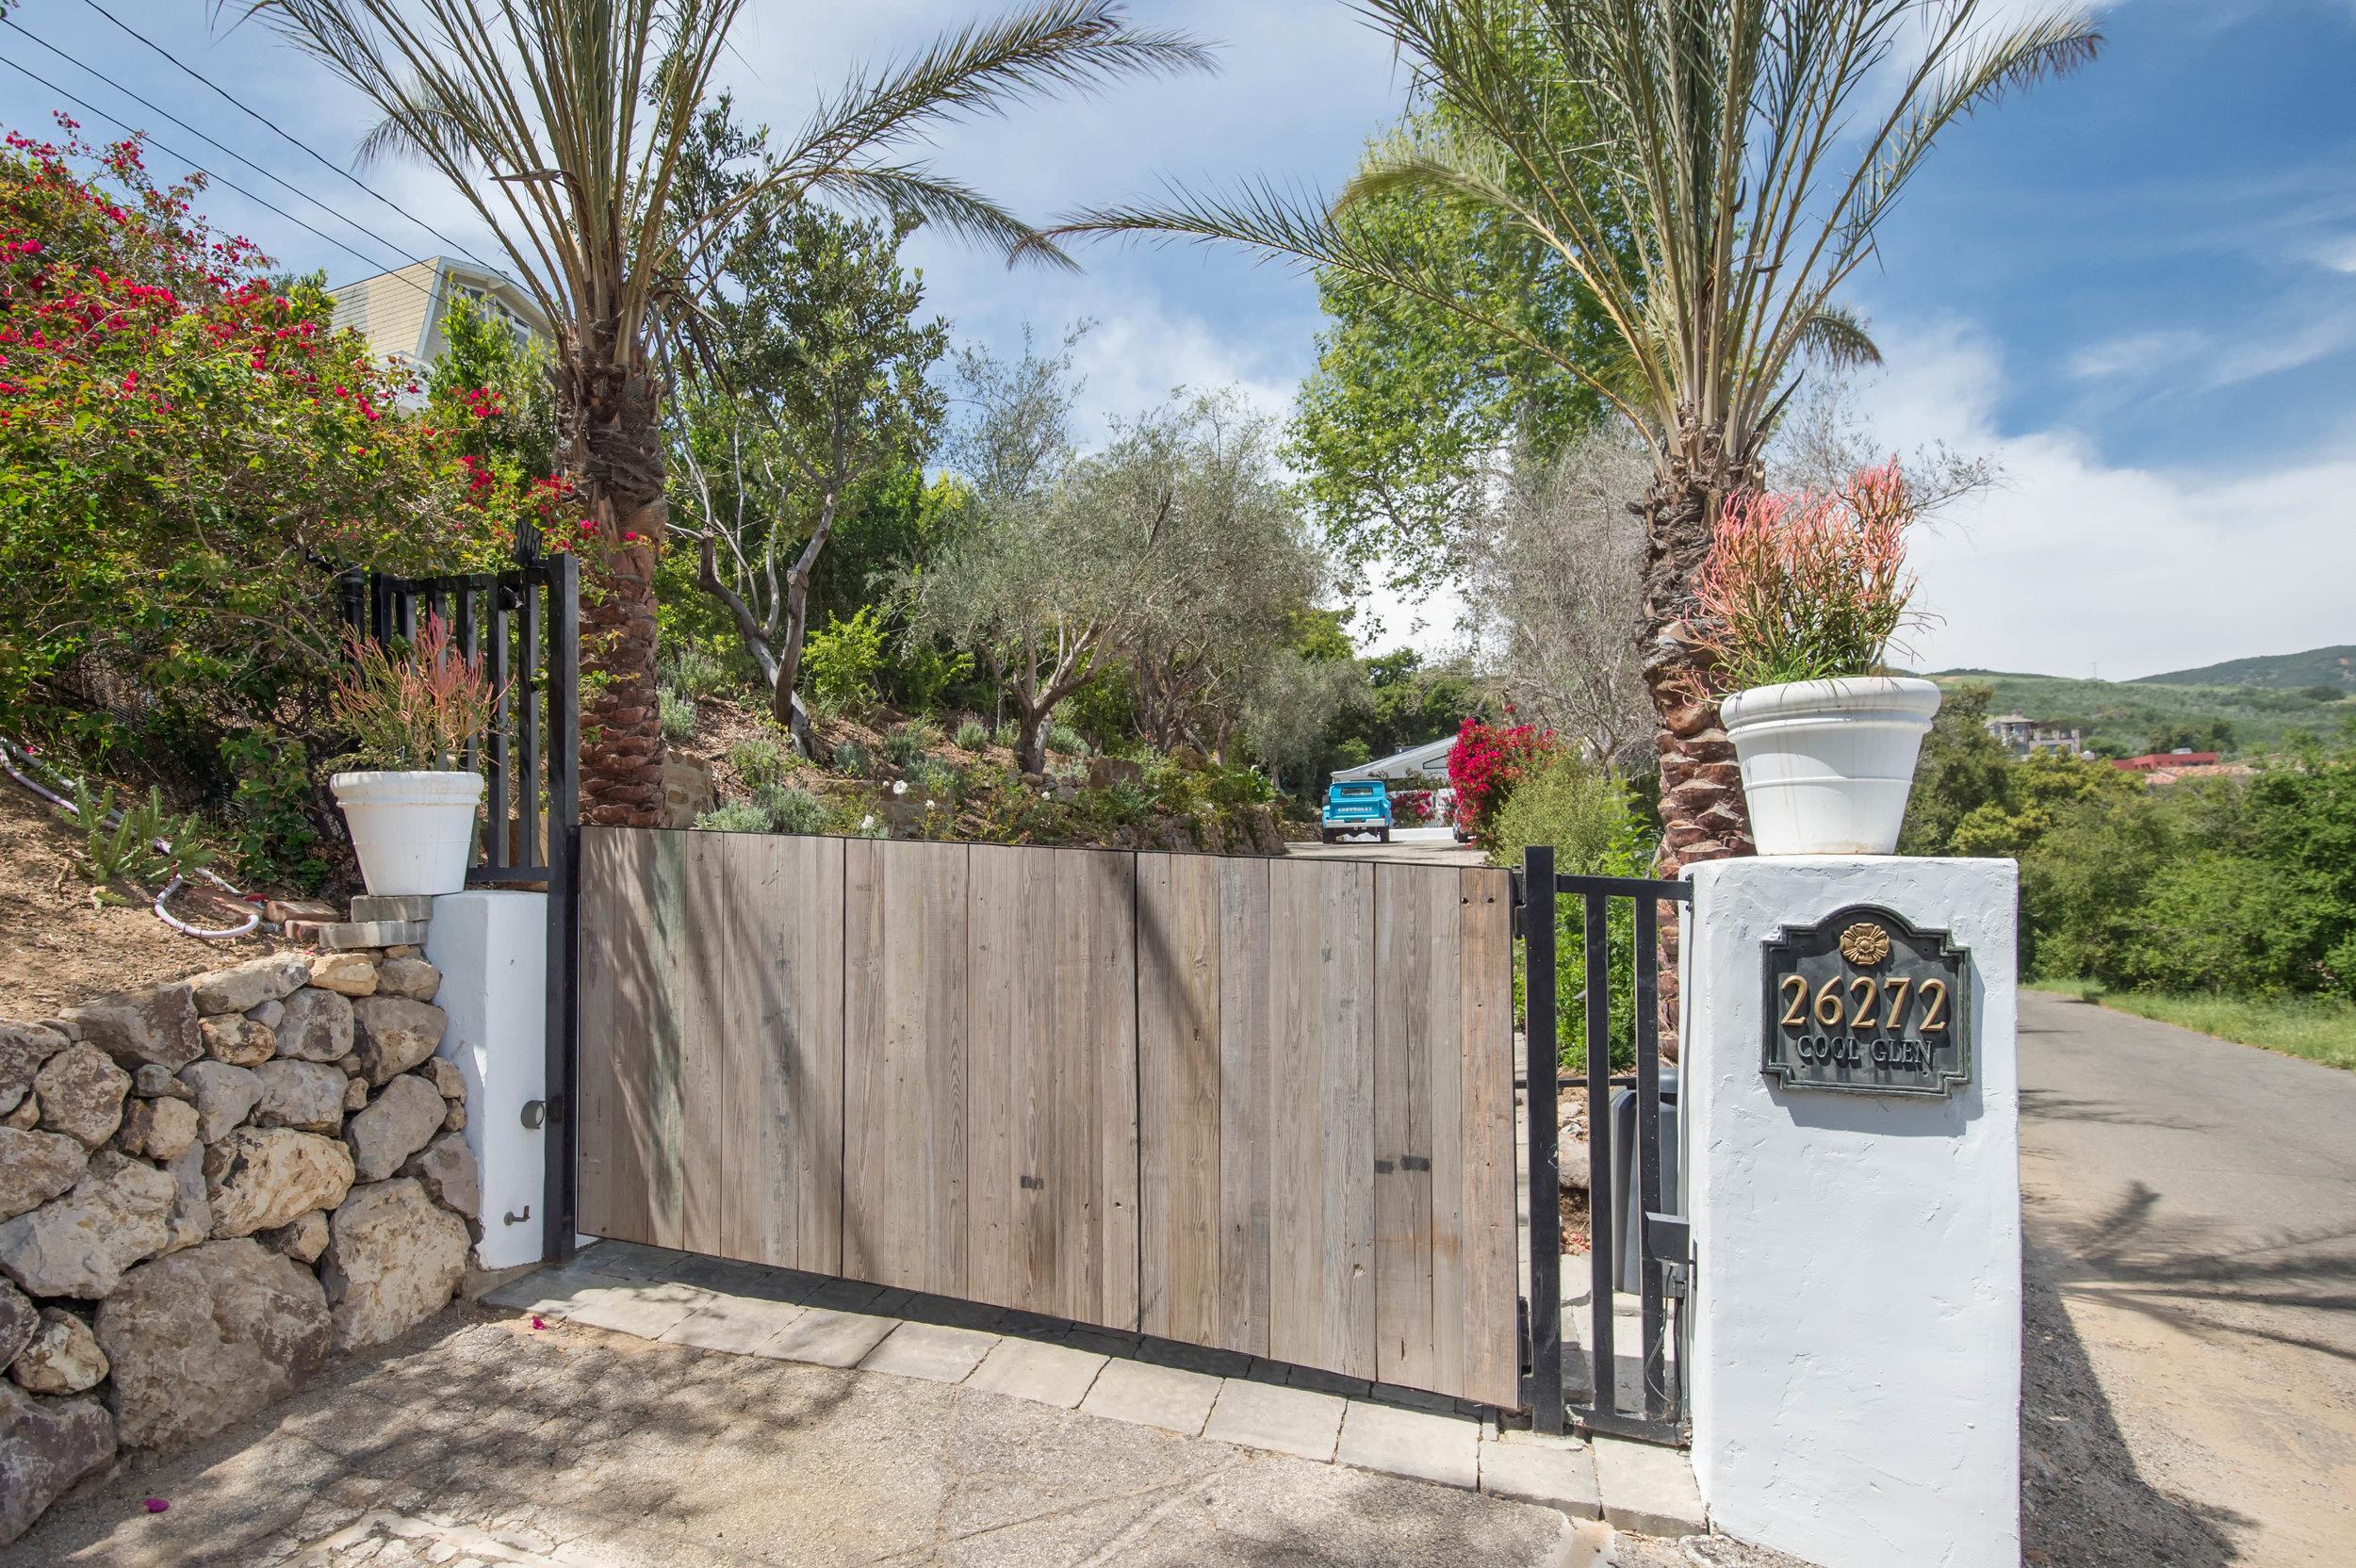 006 Gate 26272 Cool Glen Way Malibu For Sale Luxury Real Estate.jpg